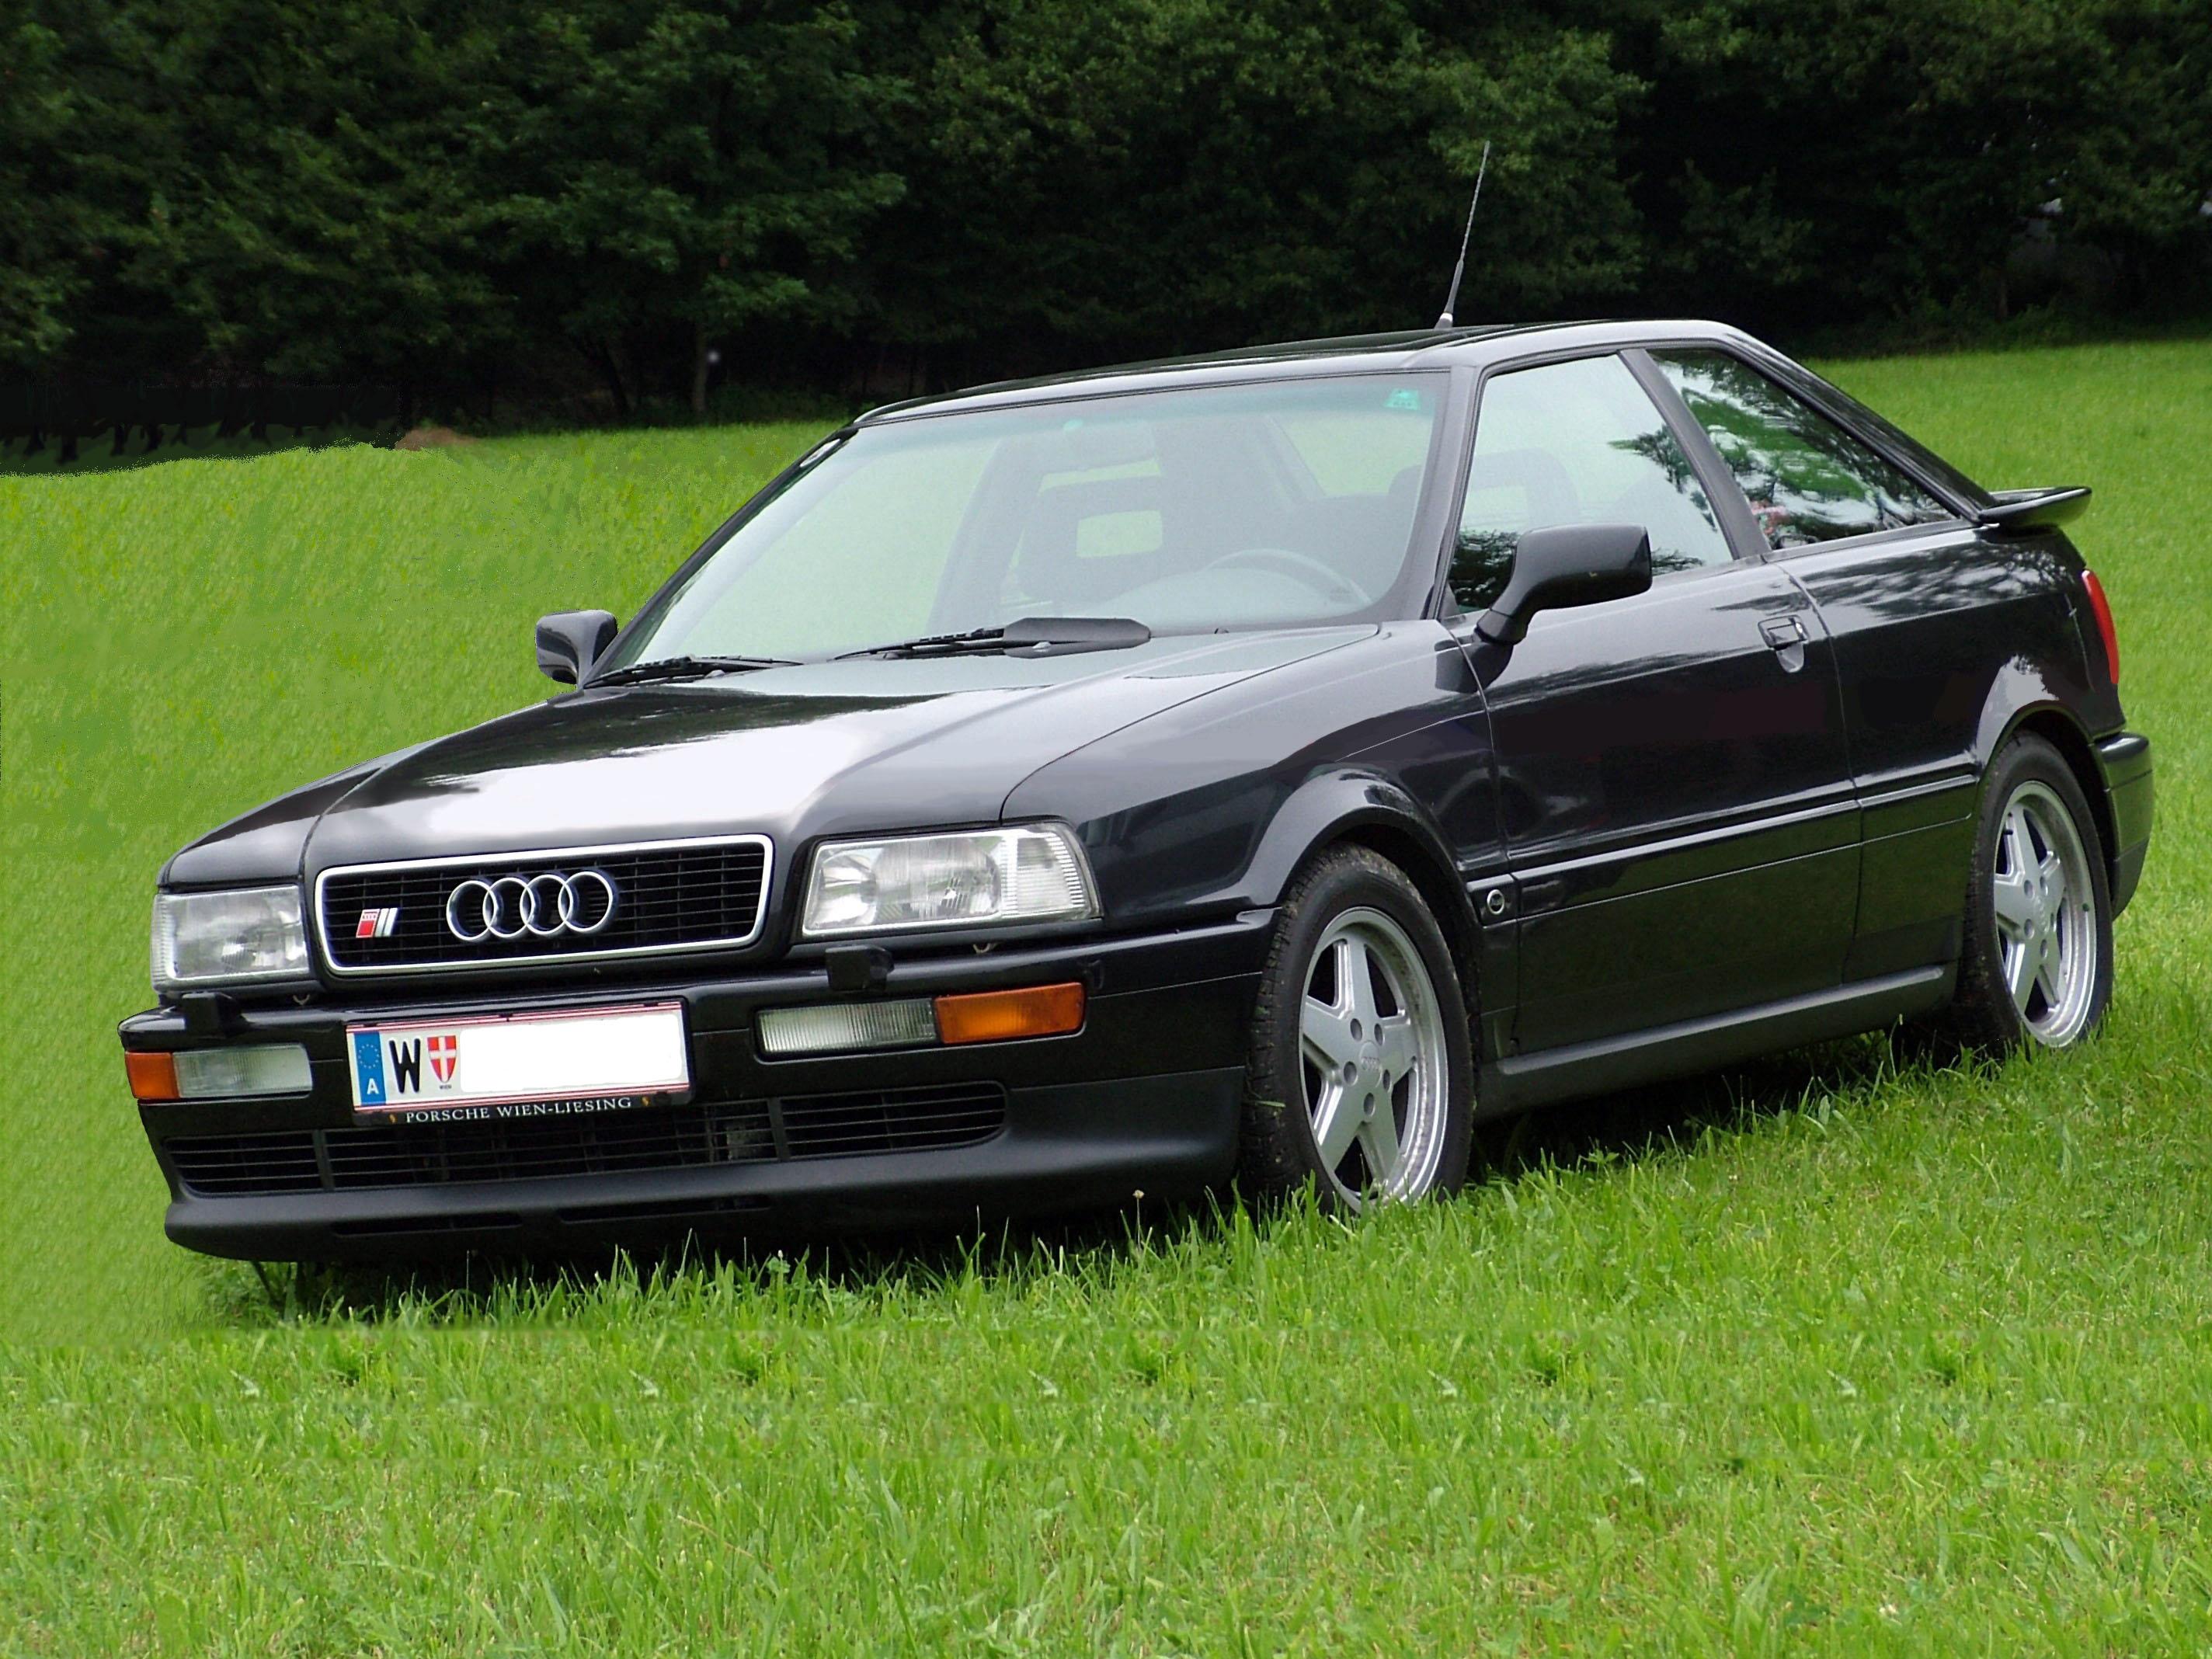 FileAudi S WikipediaJPG Wikimedia Commons - Audi car wiki